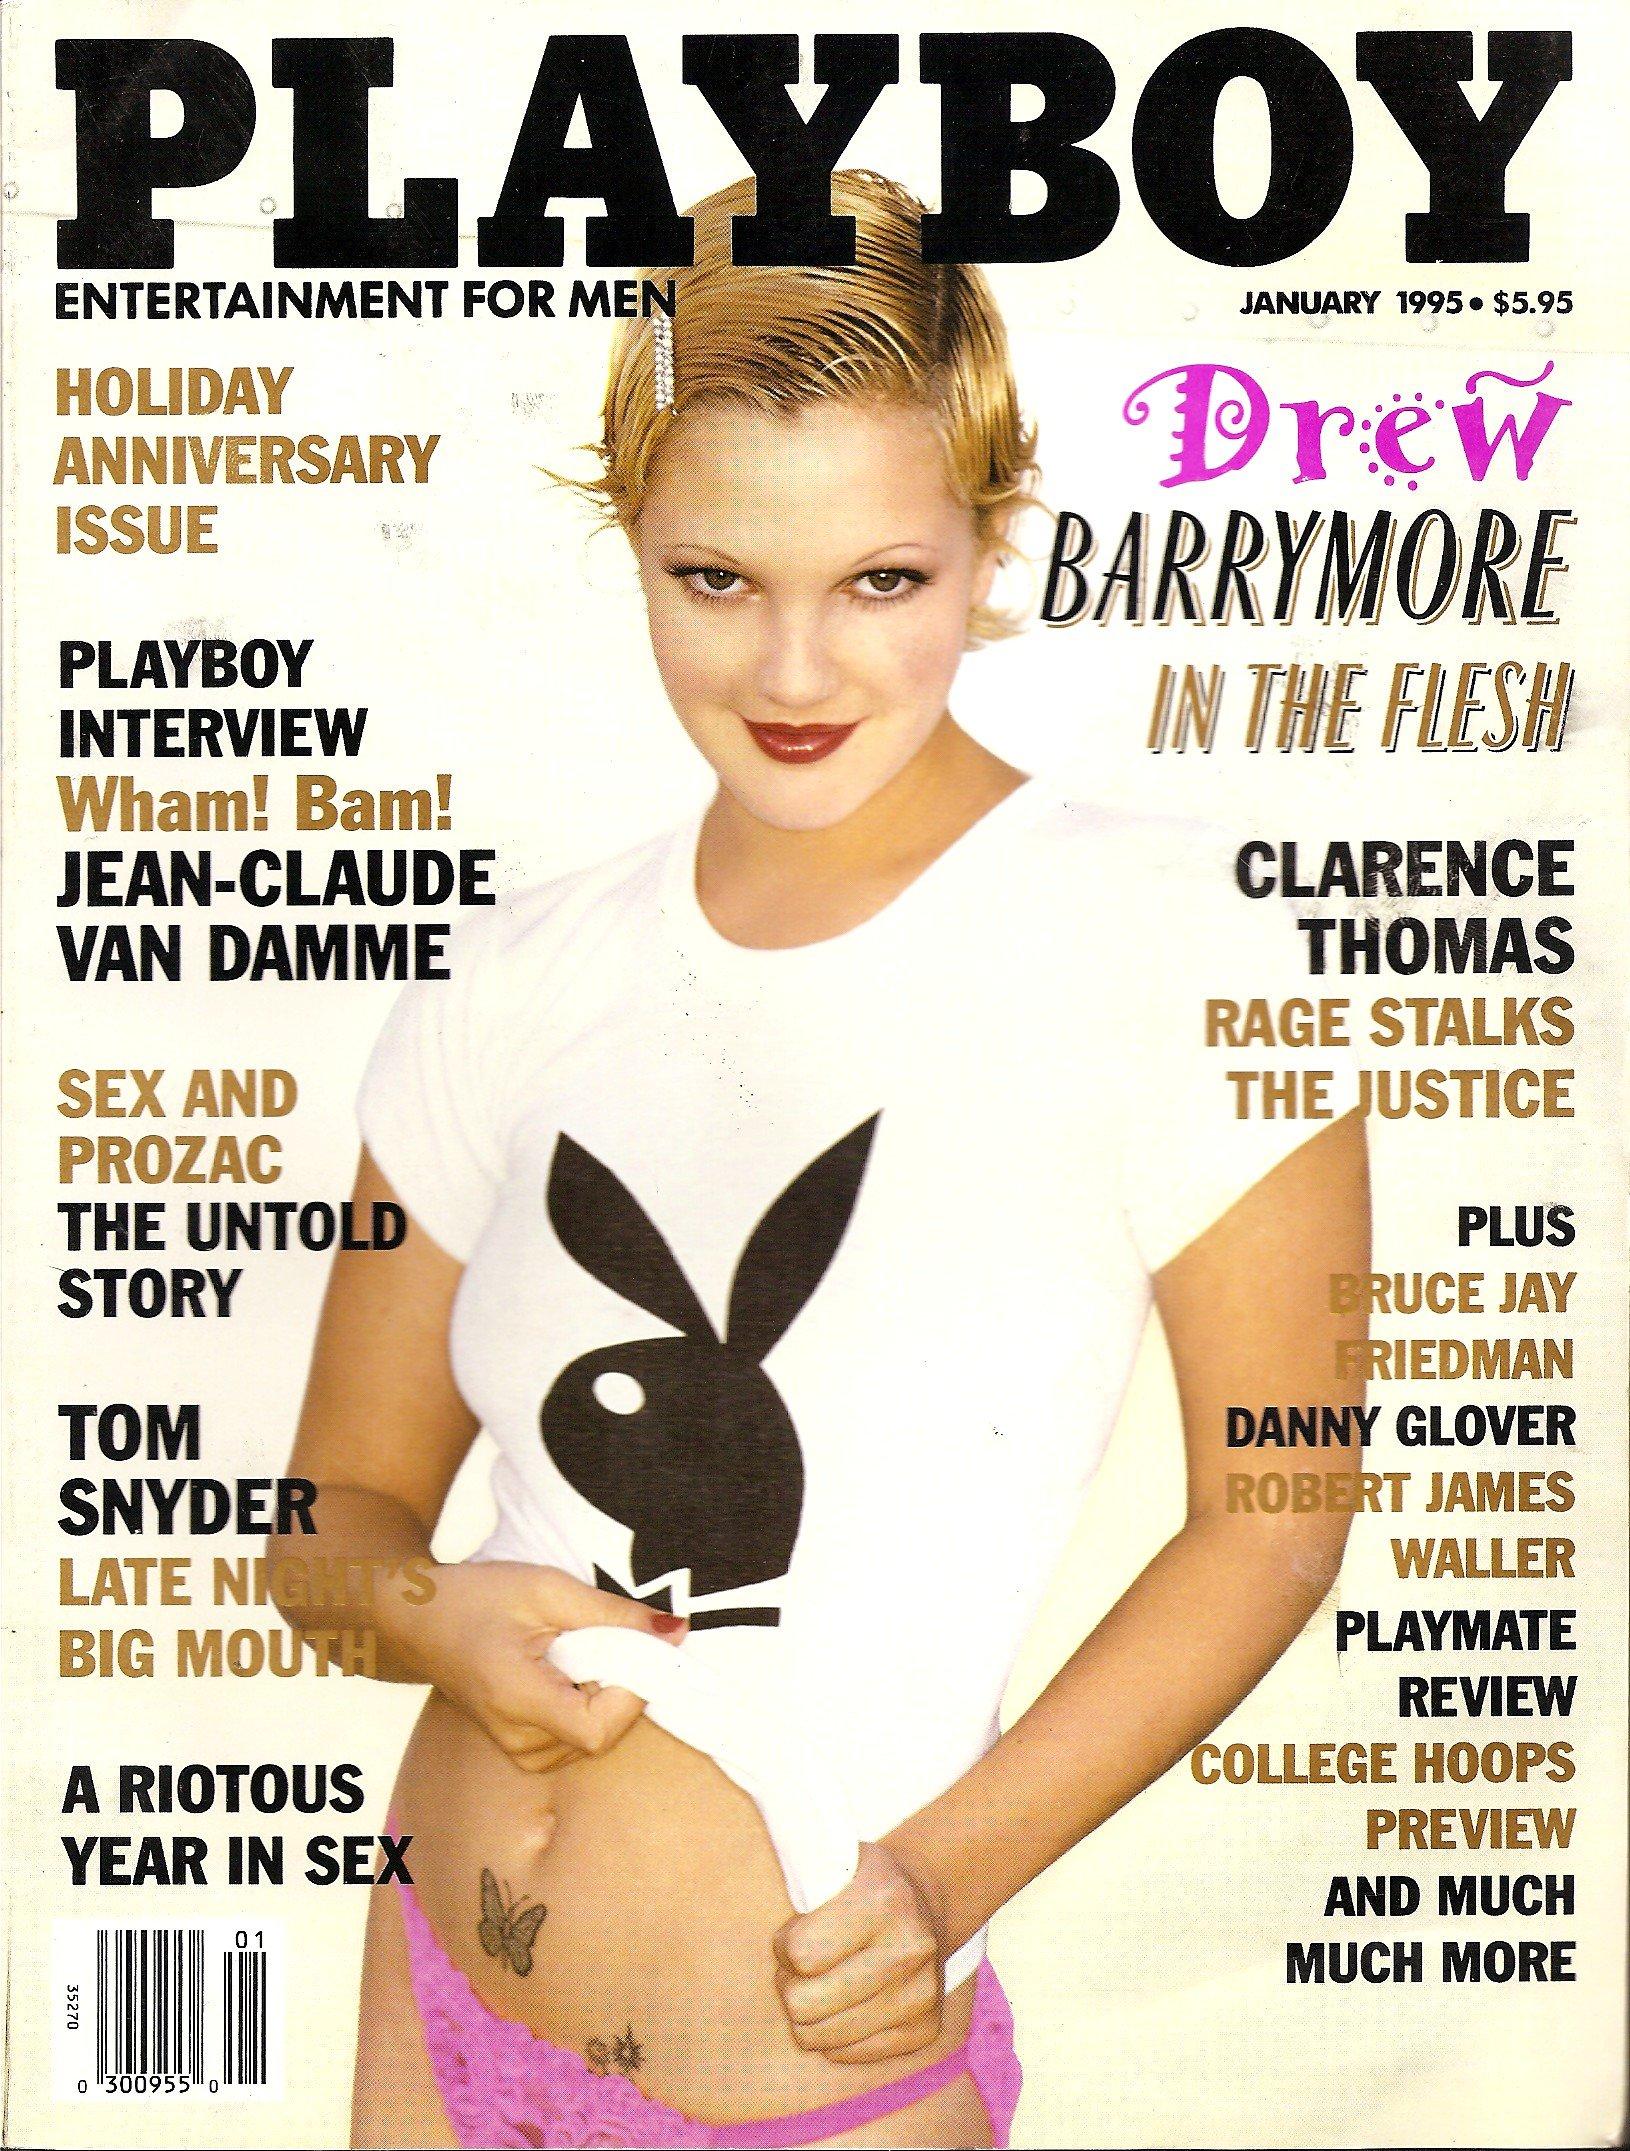 Drew Barrymore Playboy